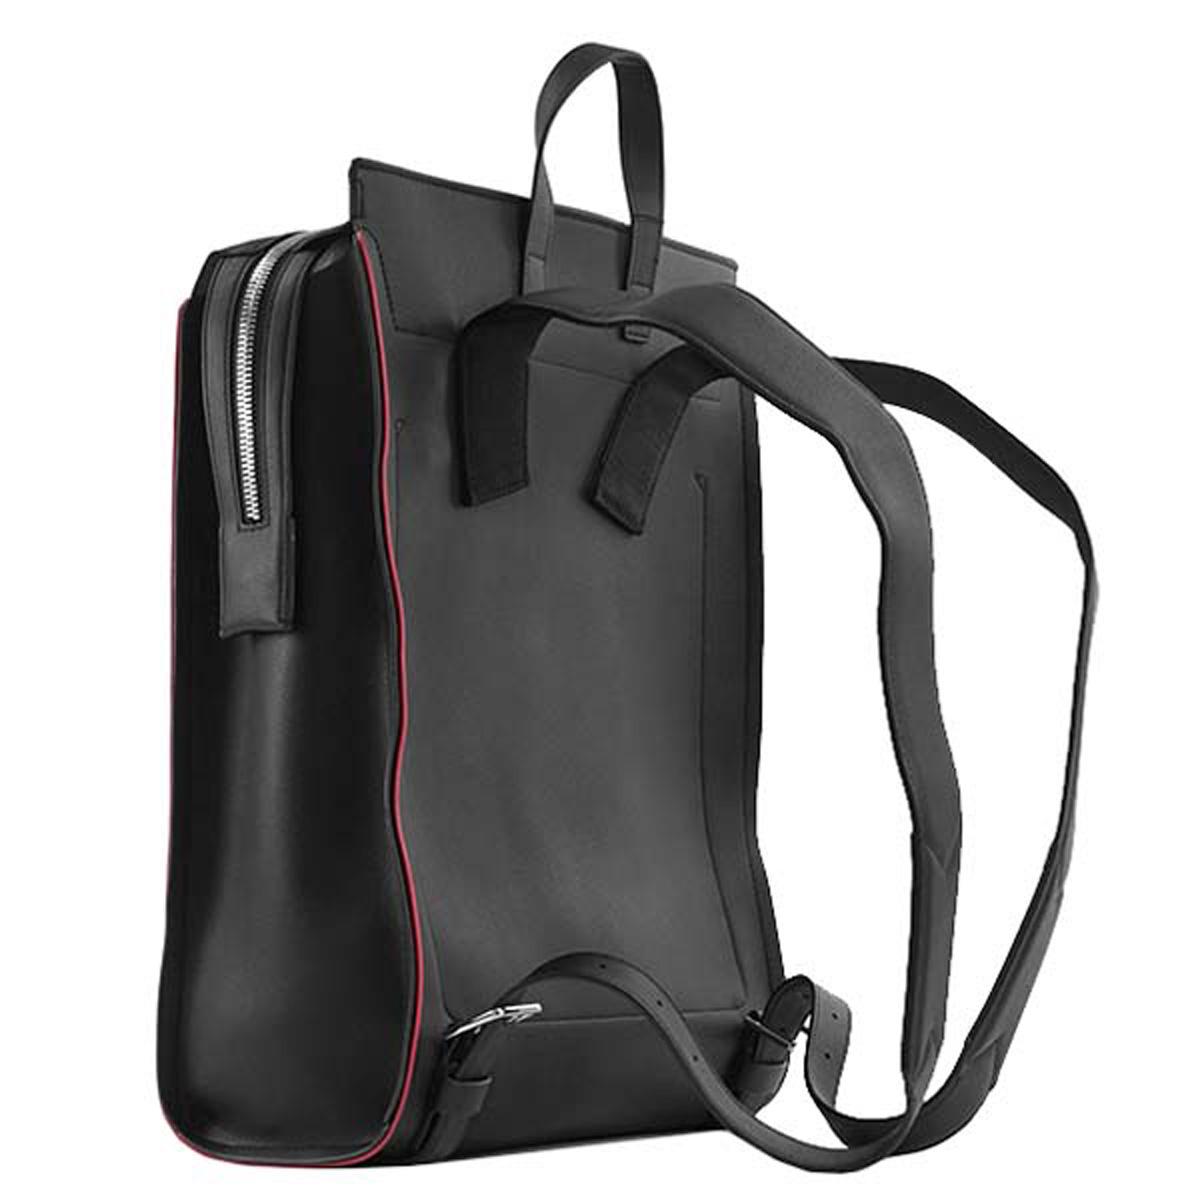 82fe88b0e41 ... Calvin Klein Calvin Klein CK rucksack K50K503927 DOUBLE EDGE FASHION  BACKPACK double edge fashion backpack 910 ...